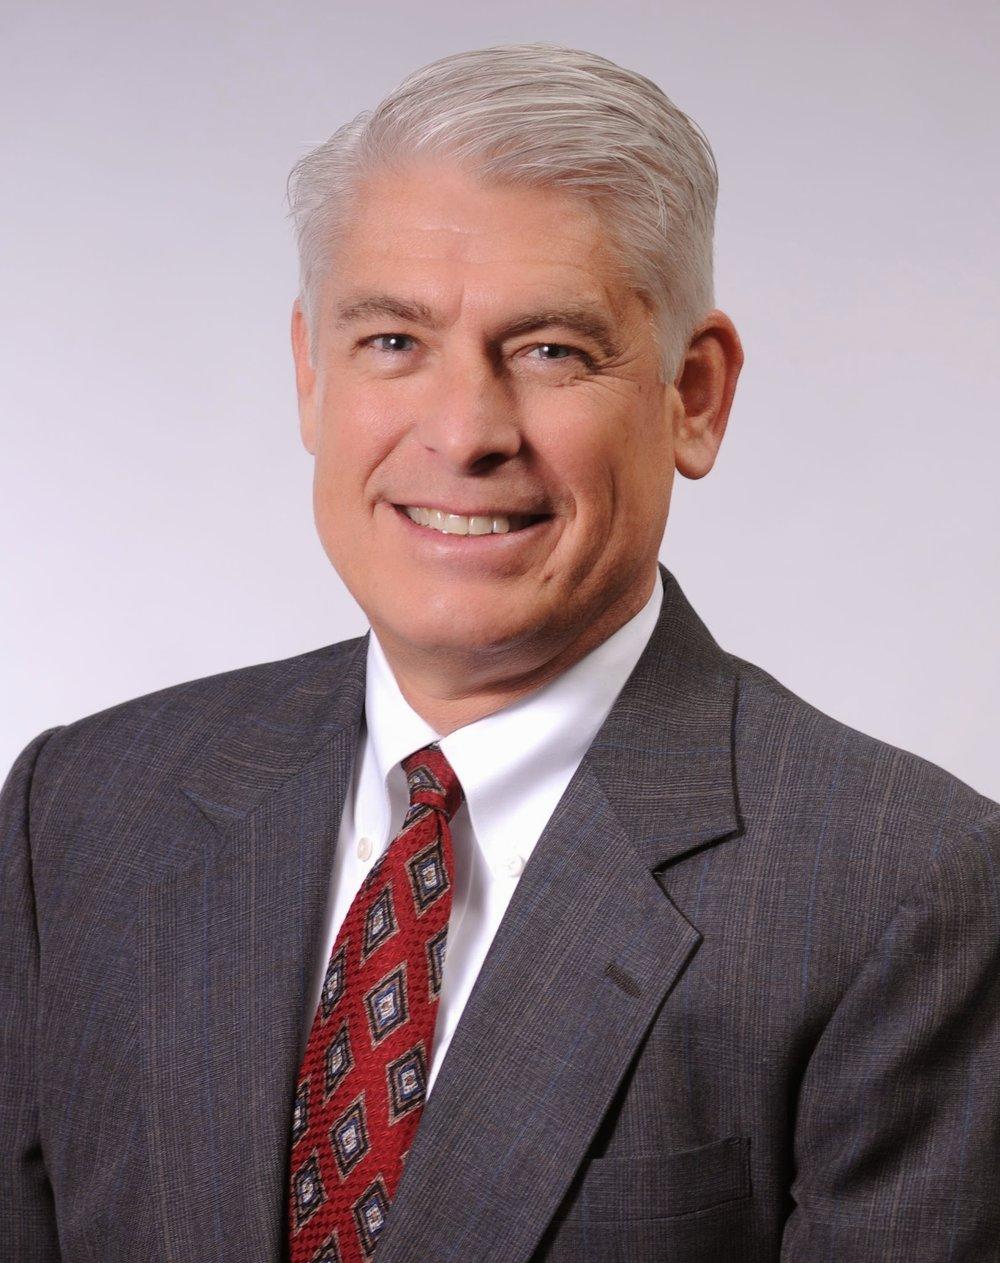 John Putnam - Senior Program Manager, Cincinnati Bell